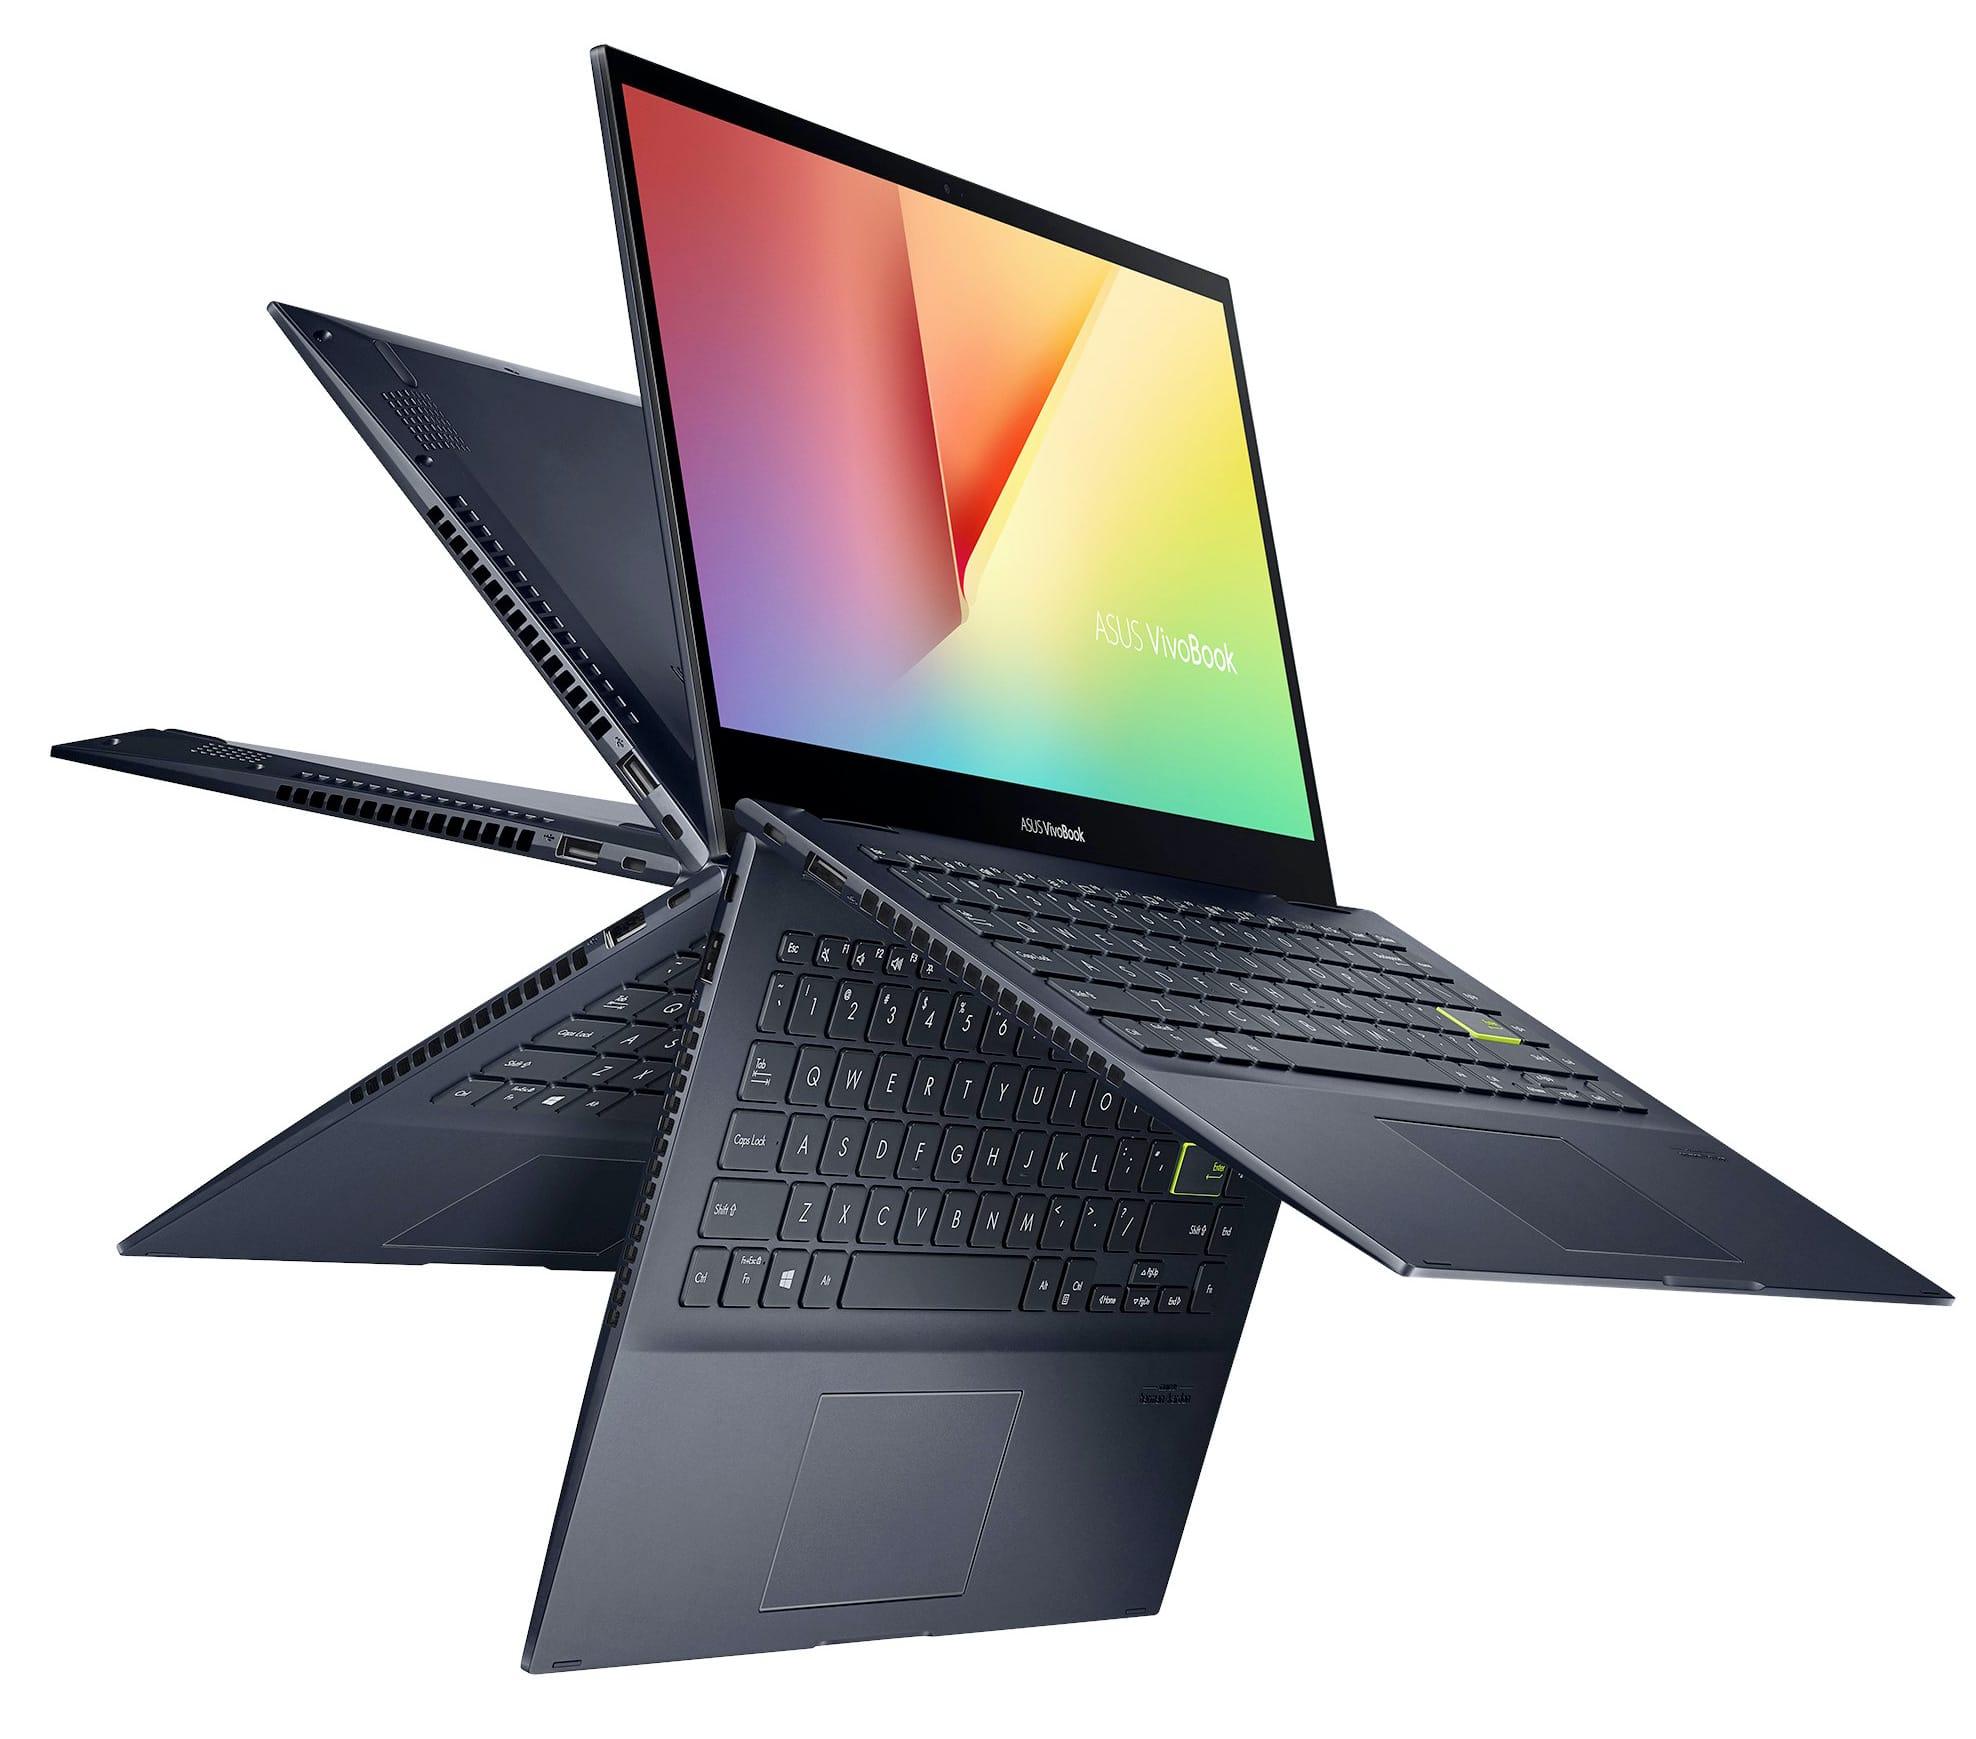 "PC Portable 14"" Asus Vivobook Flip 14 TM420IA - Ryzen 3 4300U, 8 Go de RAM, 256 Go SSD"